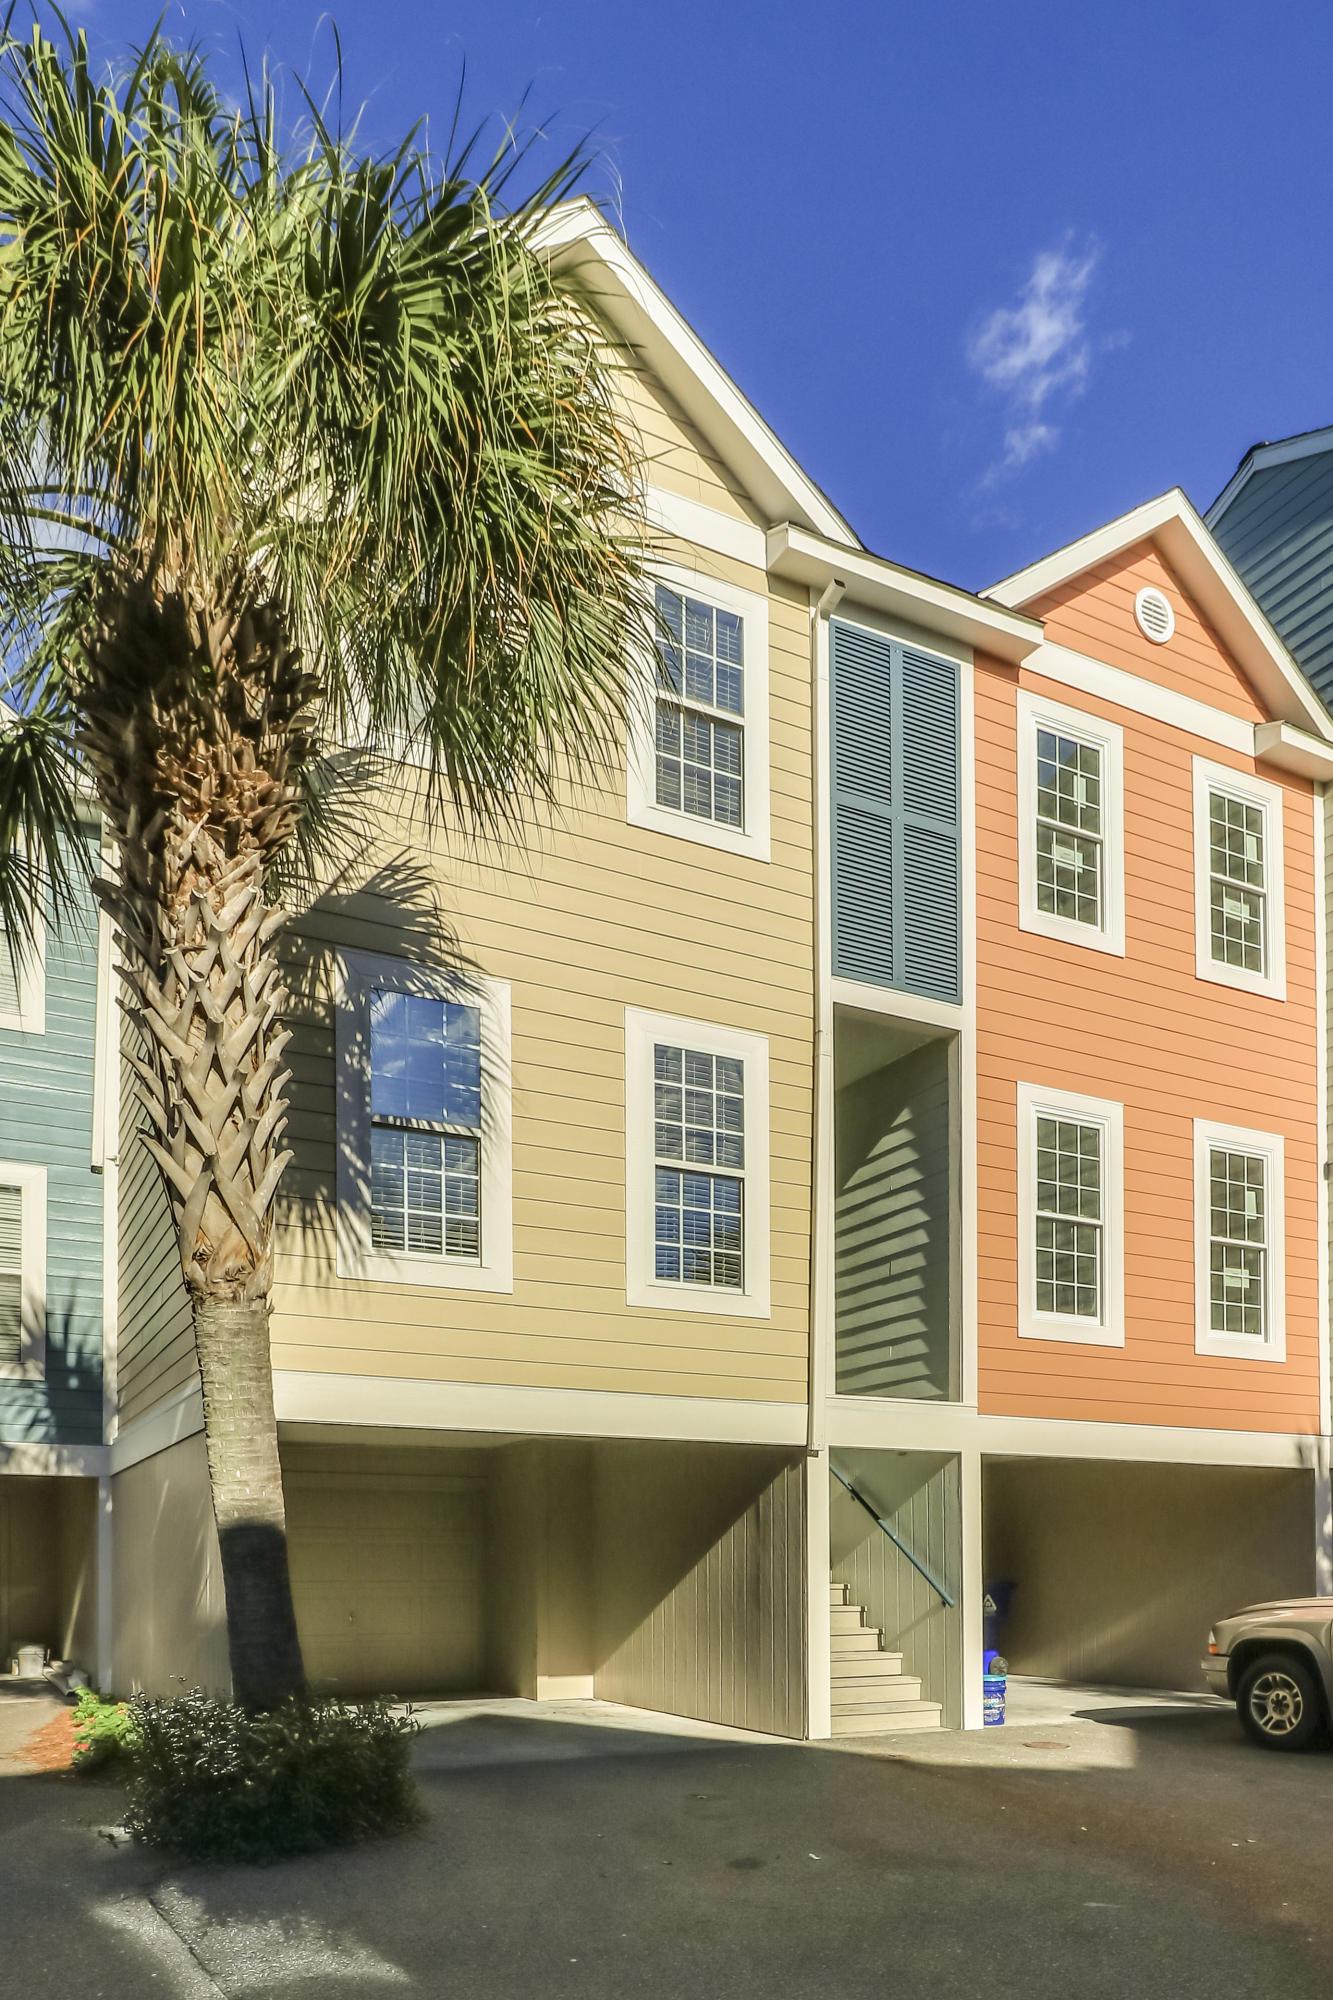 Turtle Bay Homes For Sale - 81 Sandbar, Folly Beach, SC - 0